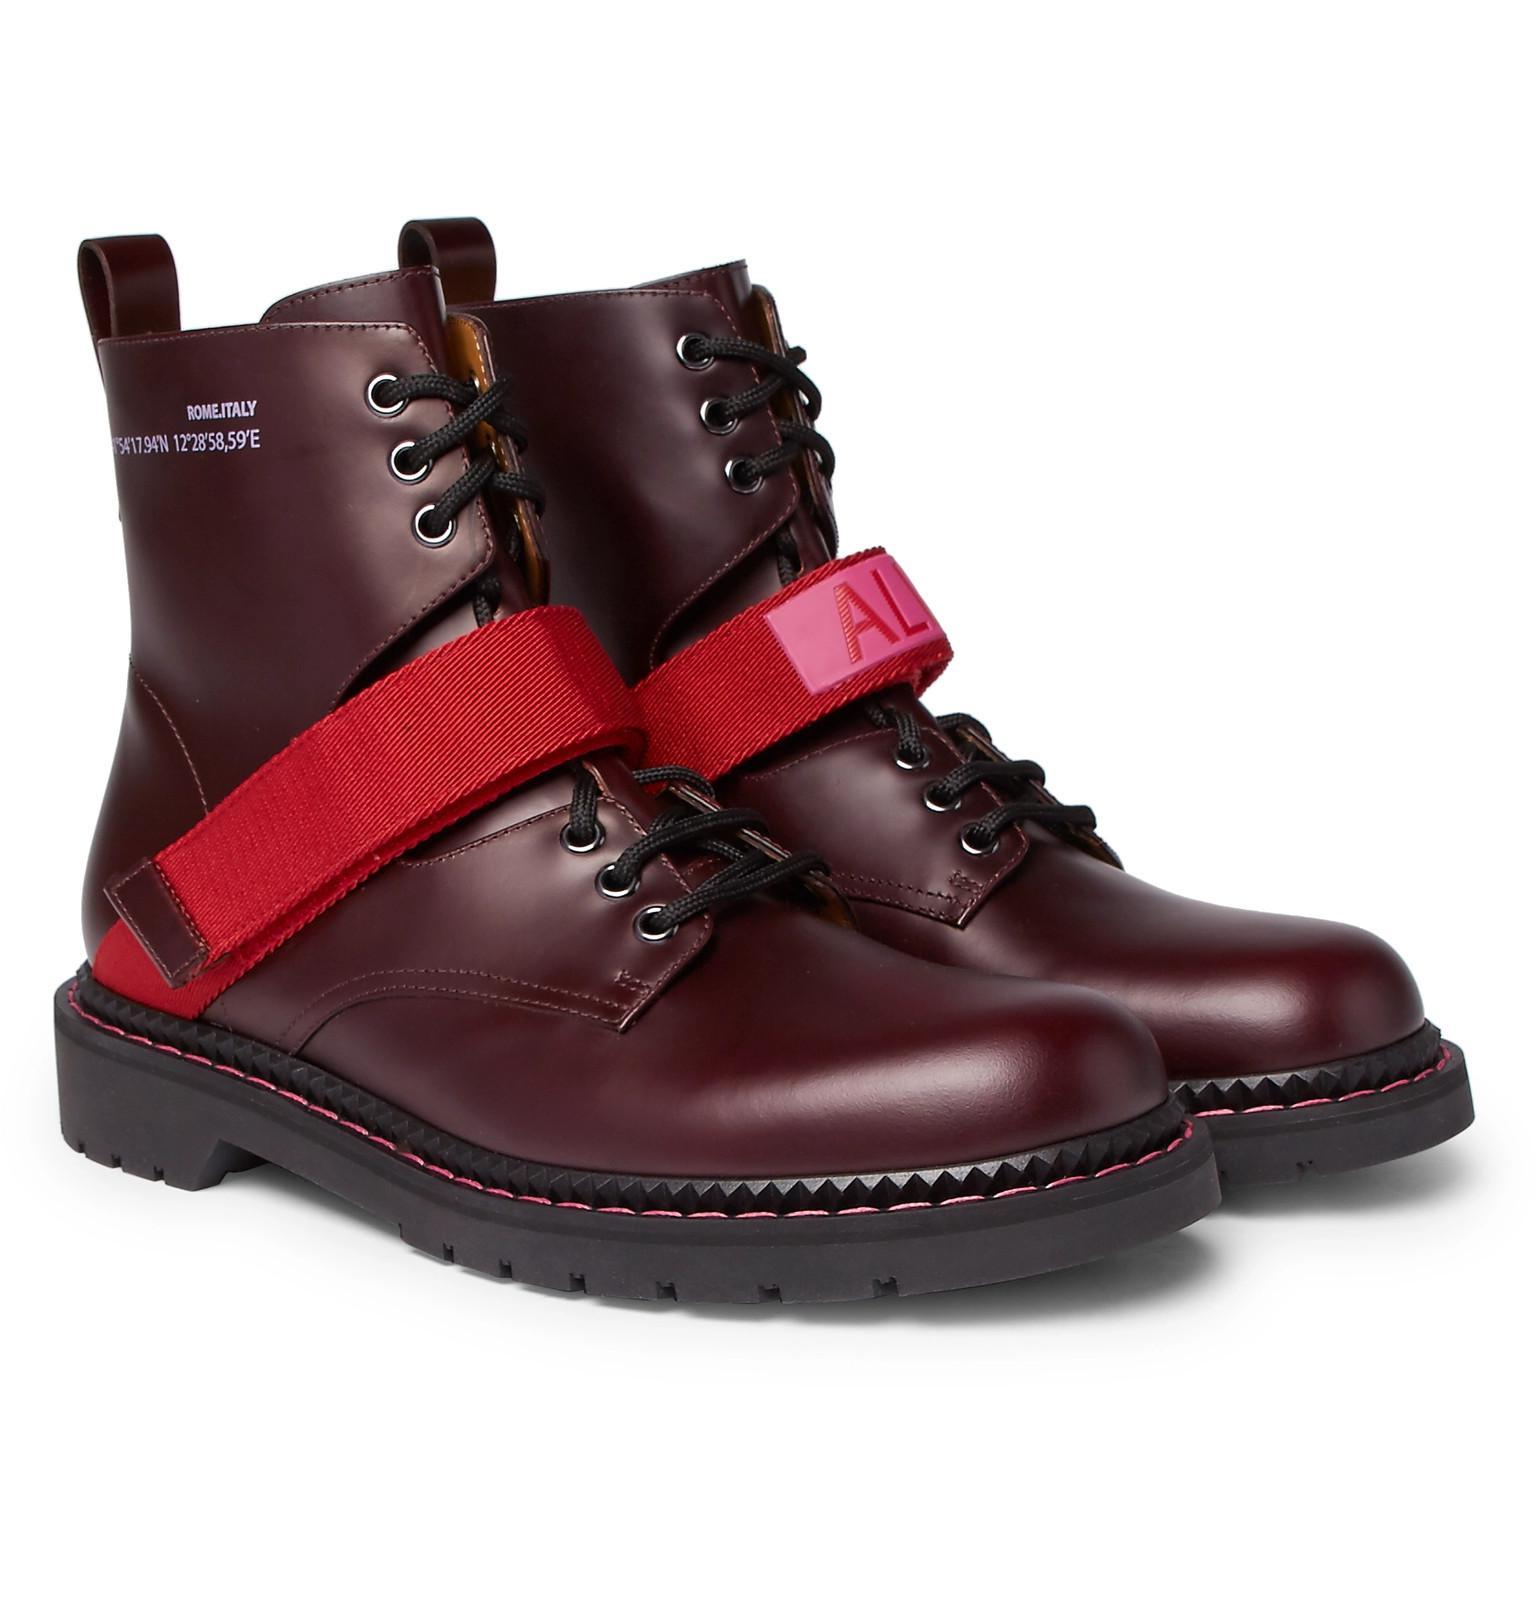 f6f5f1aca54ded Lyst - Valentino Garavani Coordinates Grosgrain-trimmed Leather ...